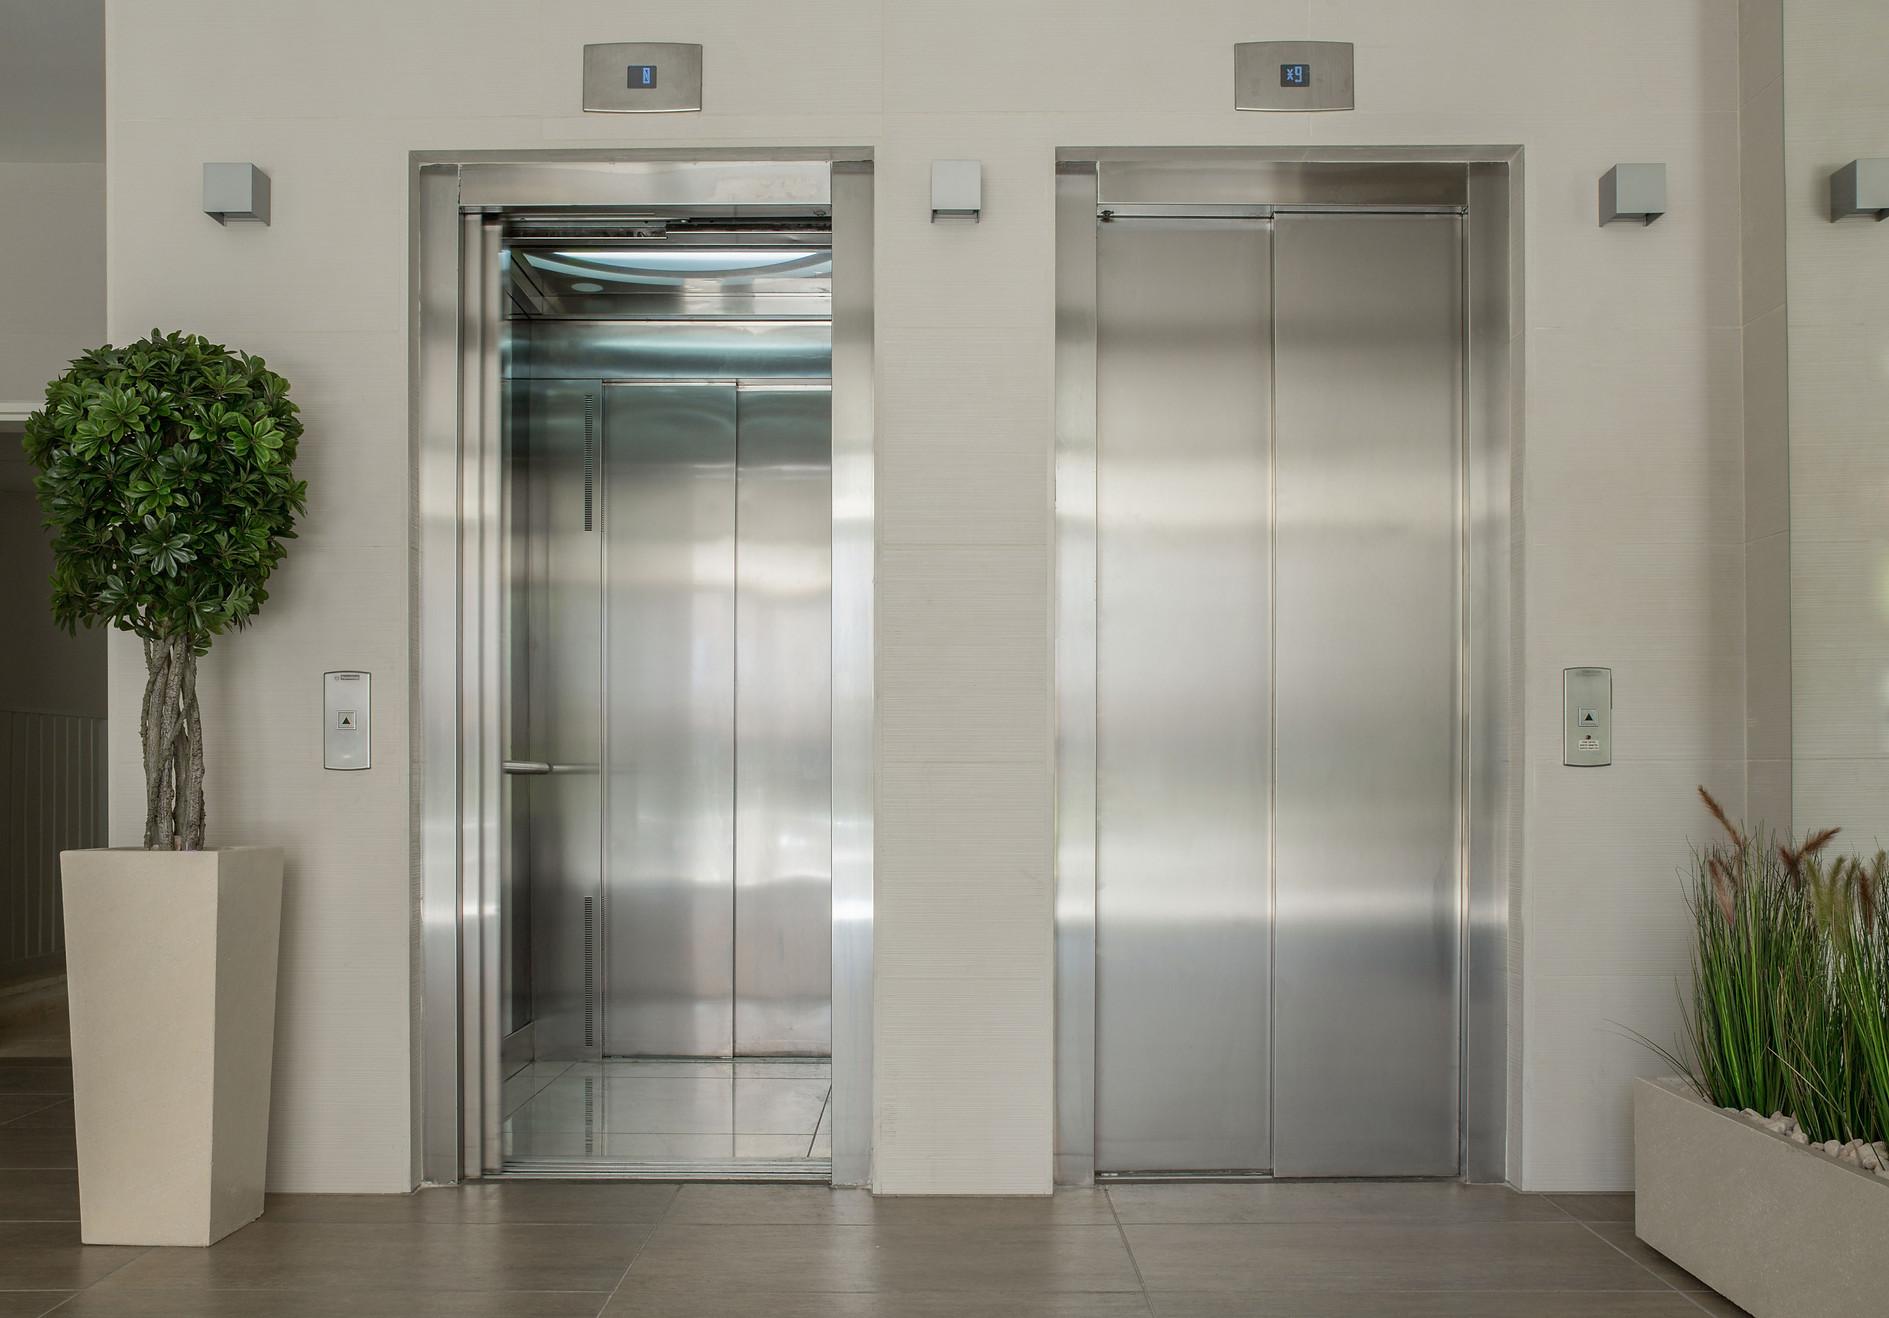 elevators-1756630.jpg